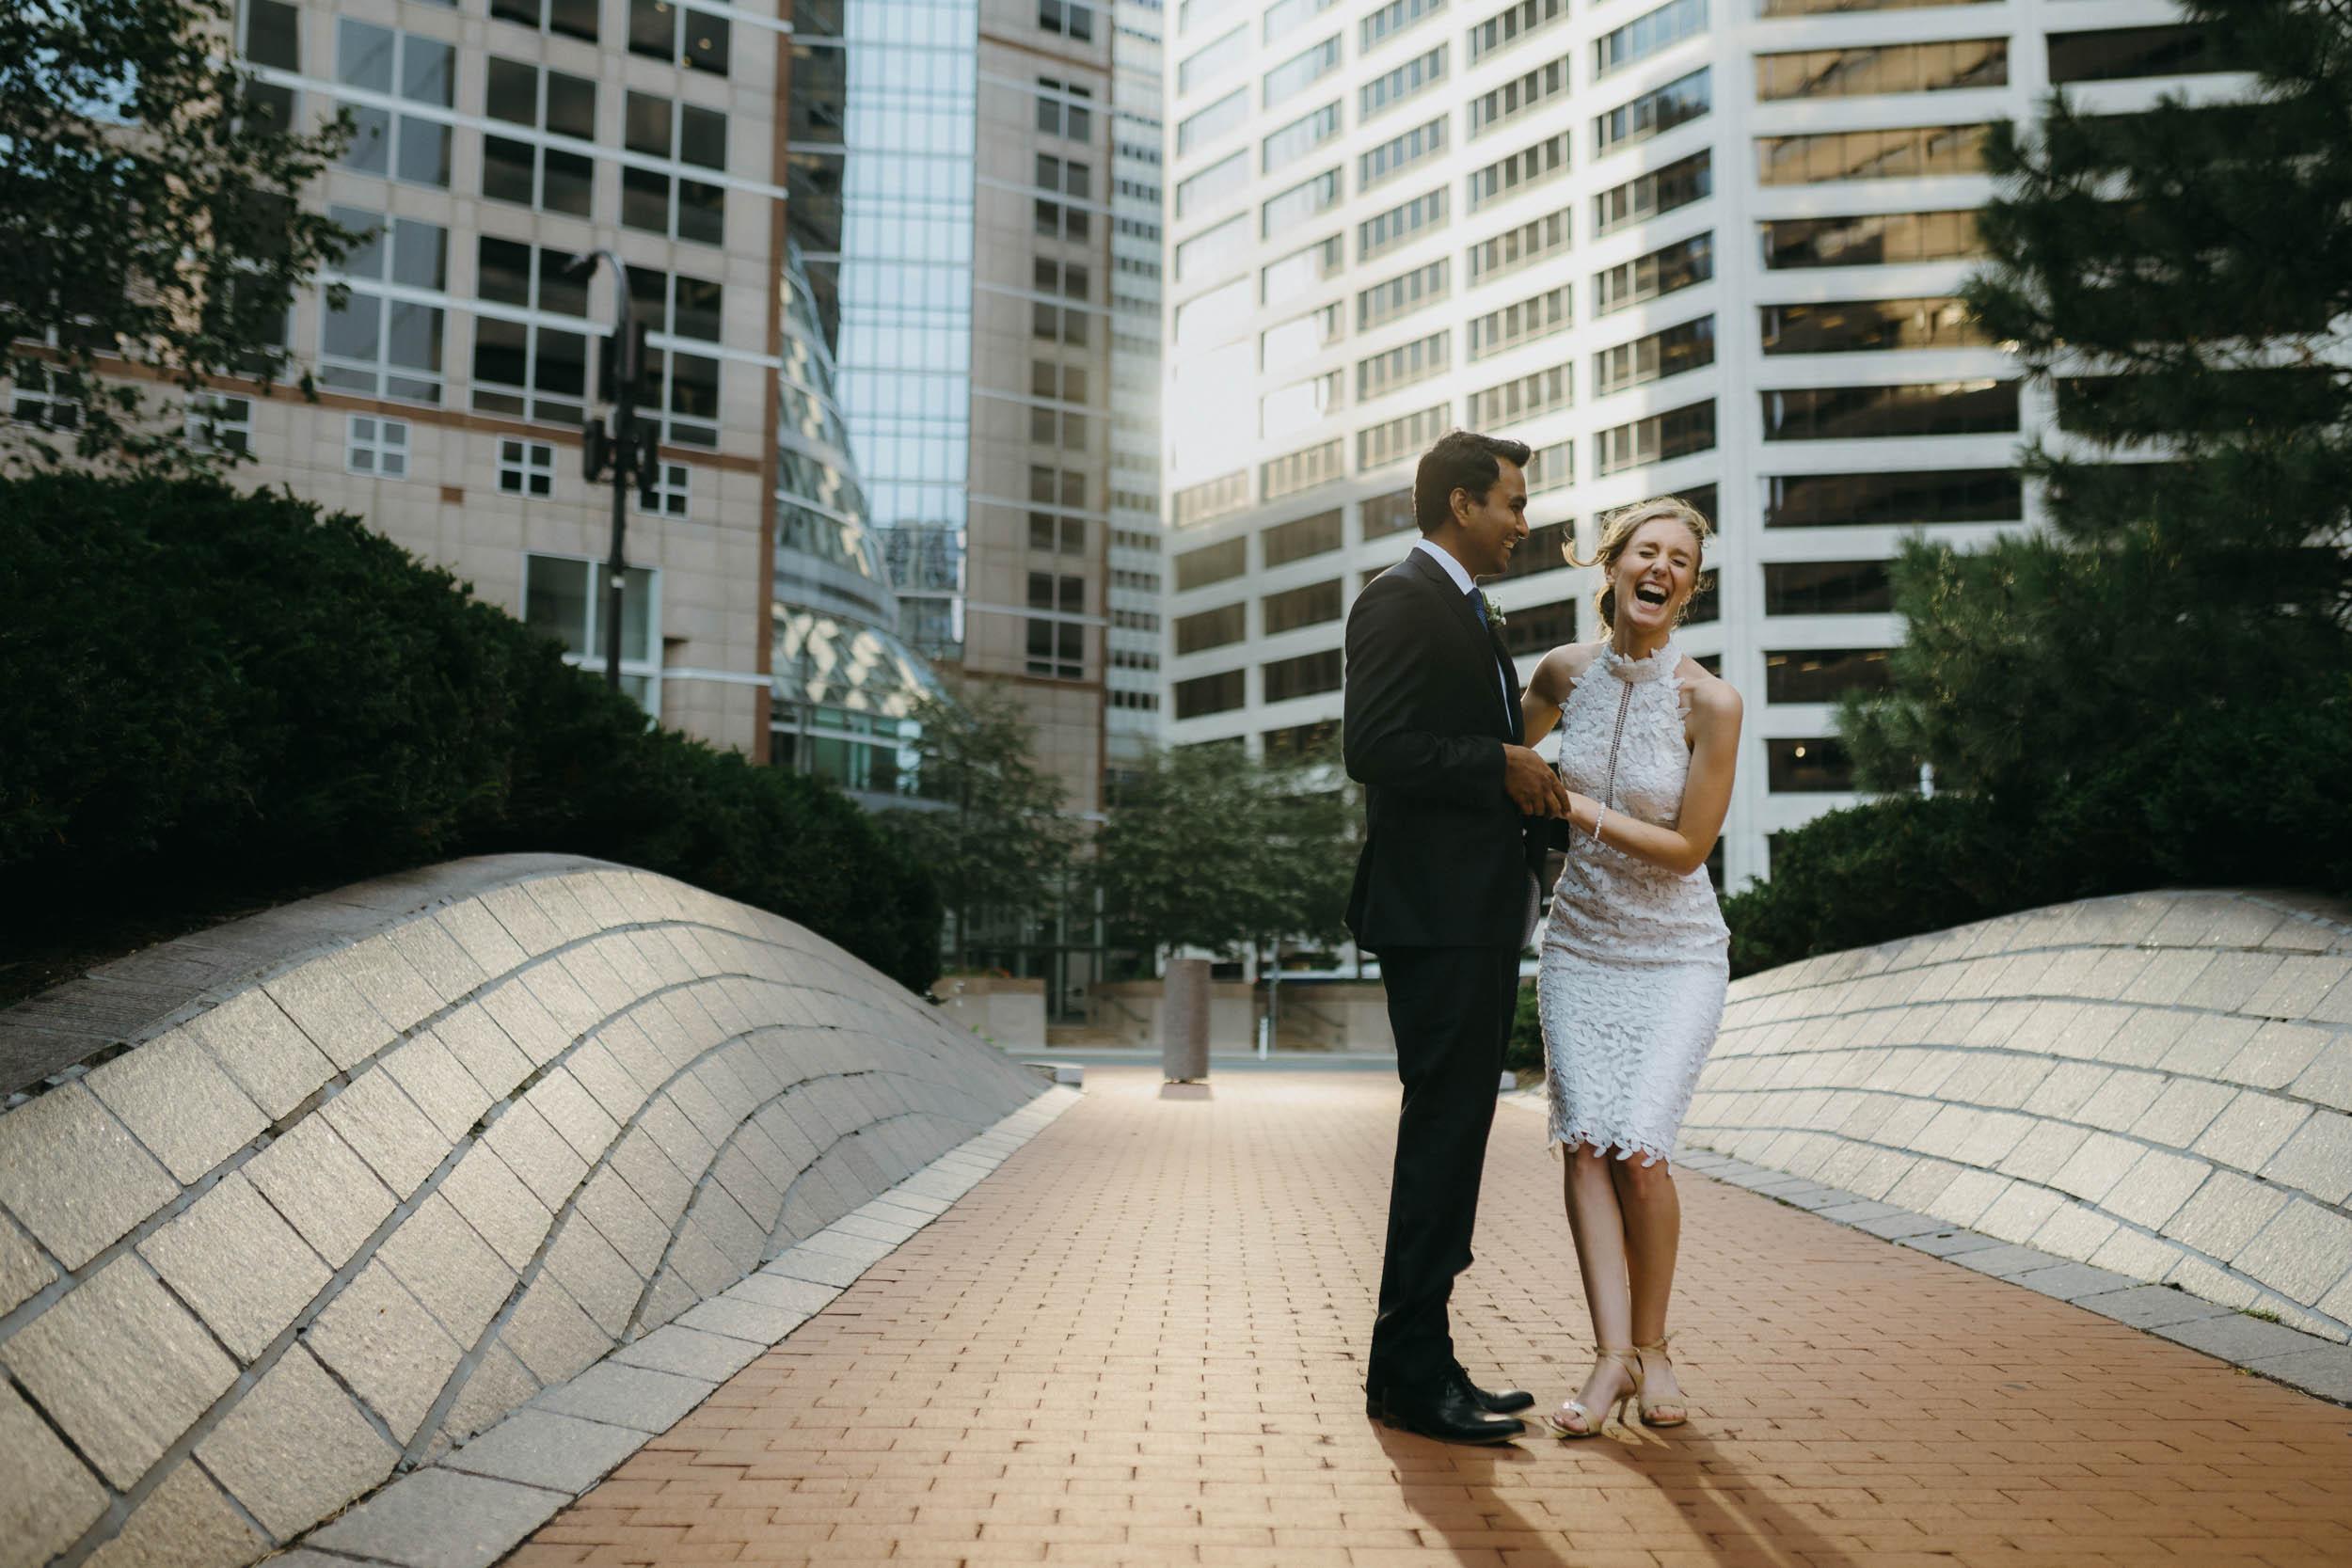 66-minneapolis elopement courthouse intimate wedding photographer-1.jpg